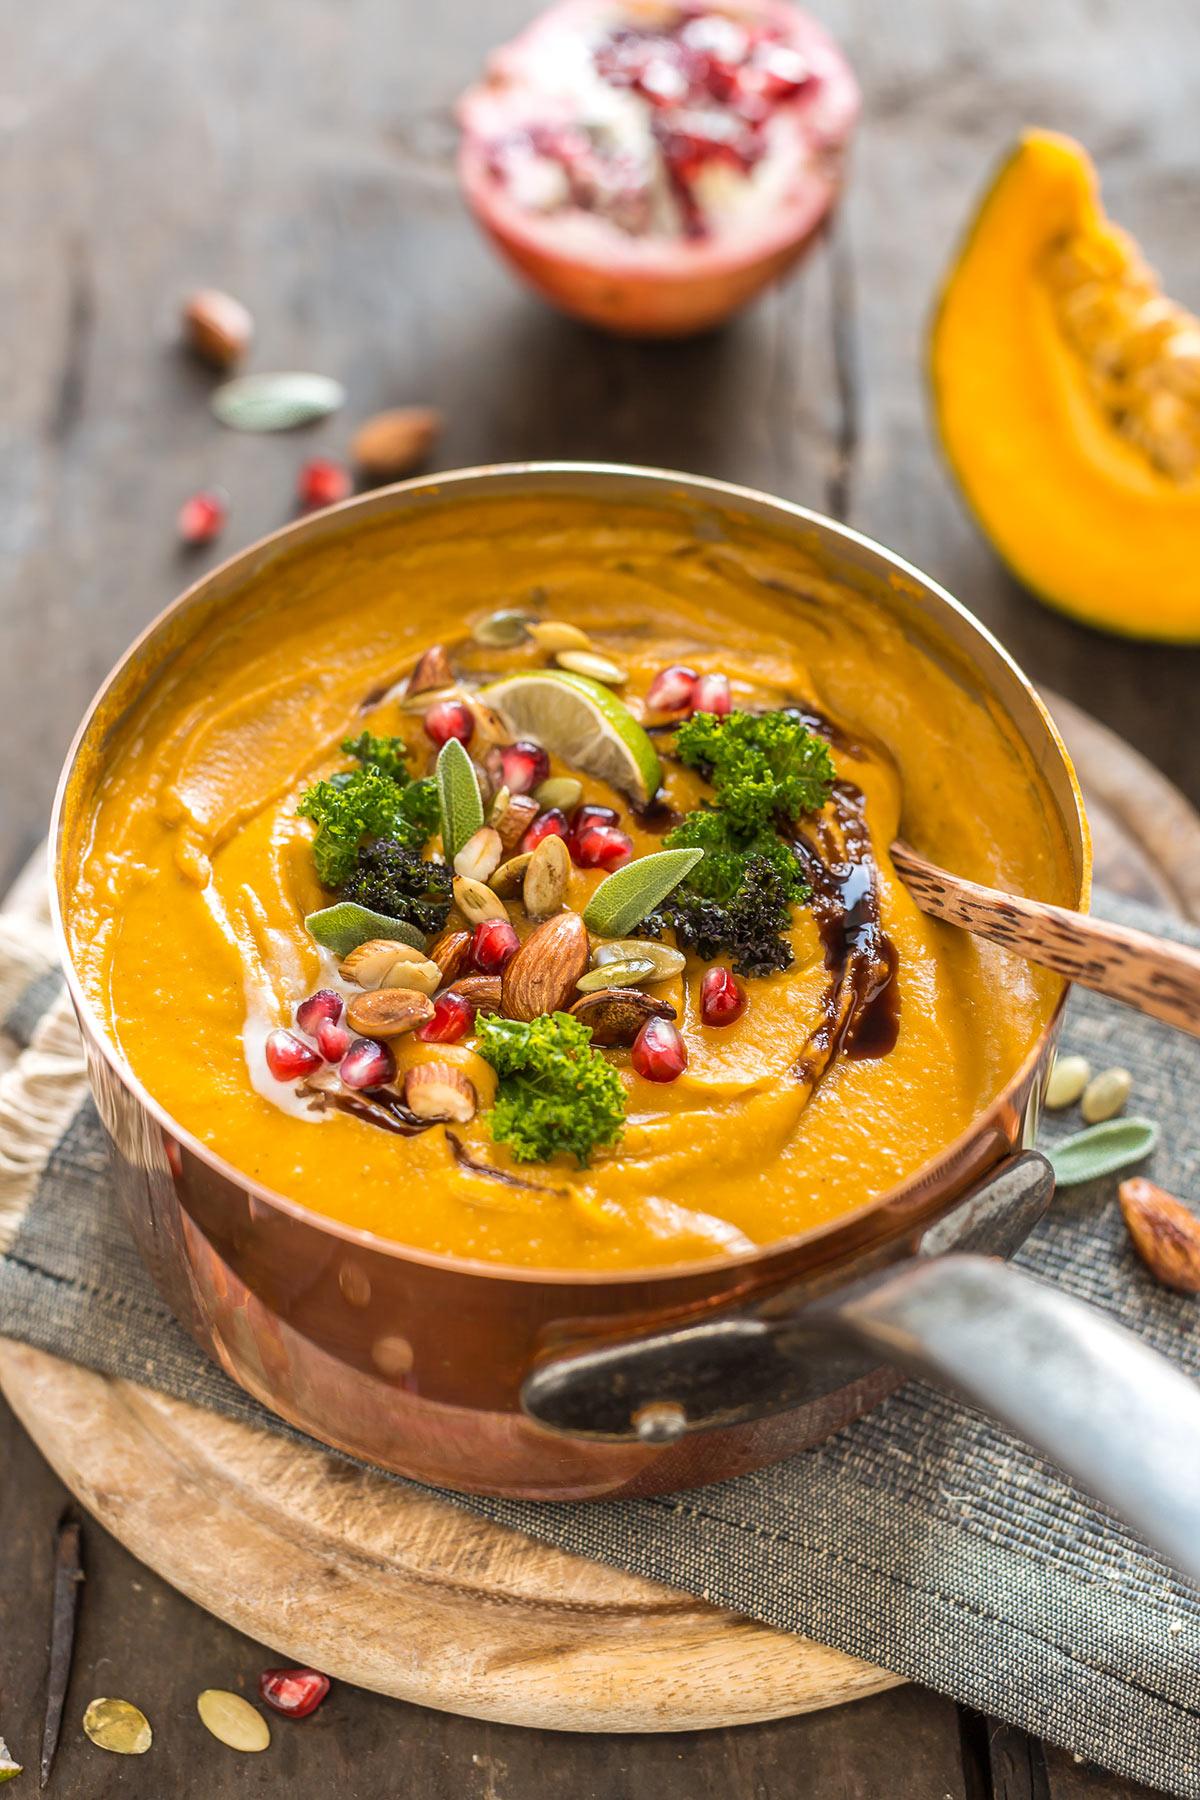 crema di zucca e lenticchie vegan senza glutine al latte di cocco e spezie vegan coconut pumpkin lentil soup - #pumpkin #soup #lentil #zucca